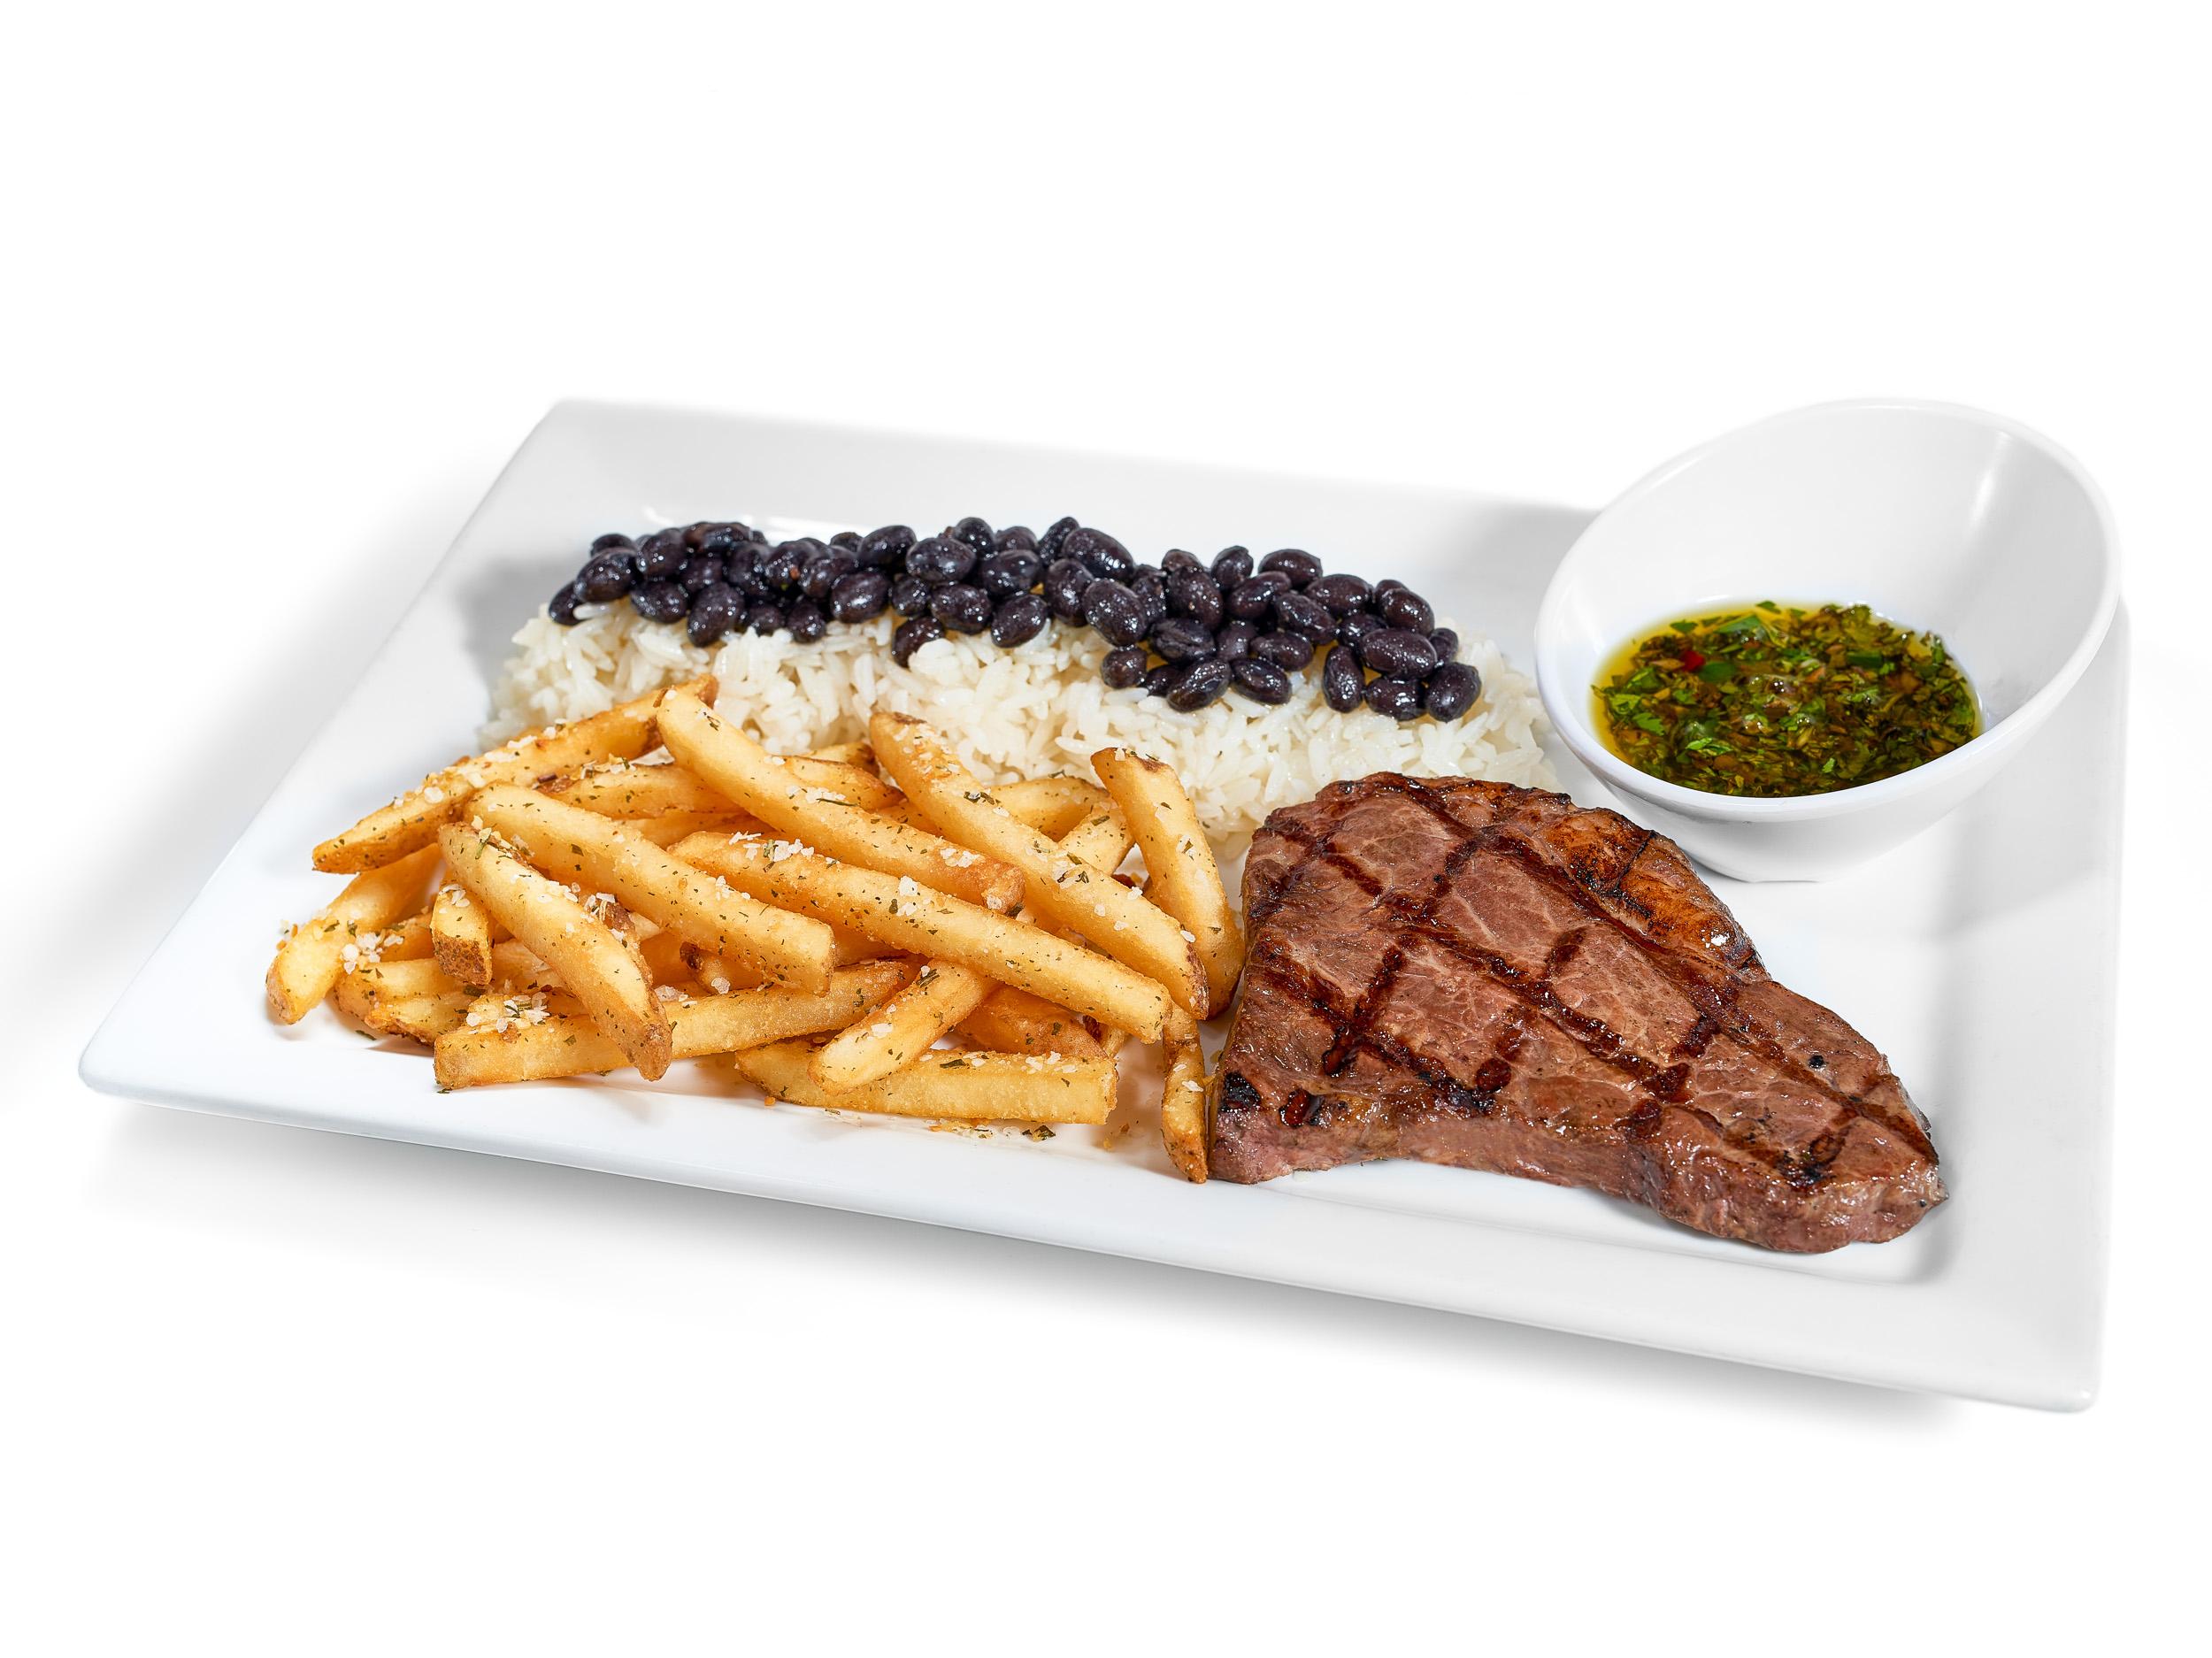 Miami_Fort_Lauderdale_food_photographer_giraffas_steak_Franklin_Castillo-Edit.jpg